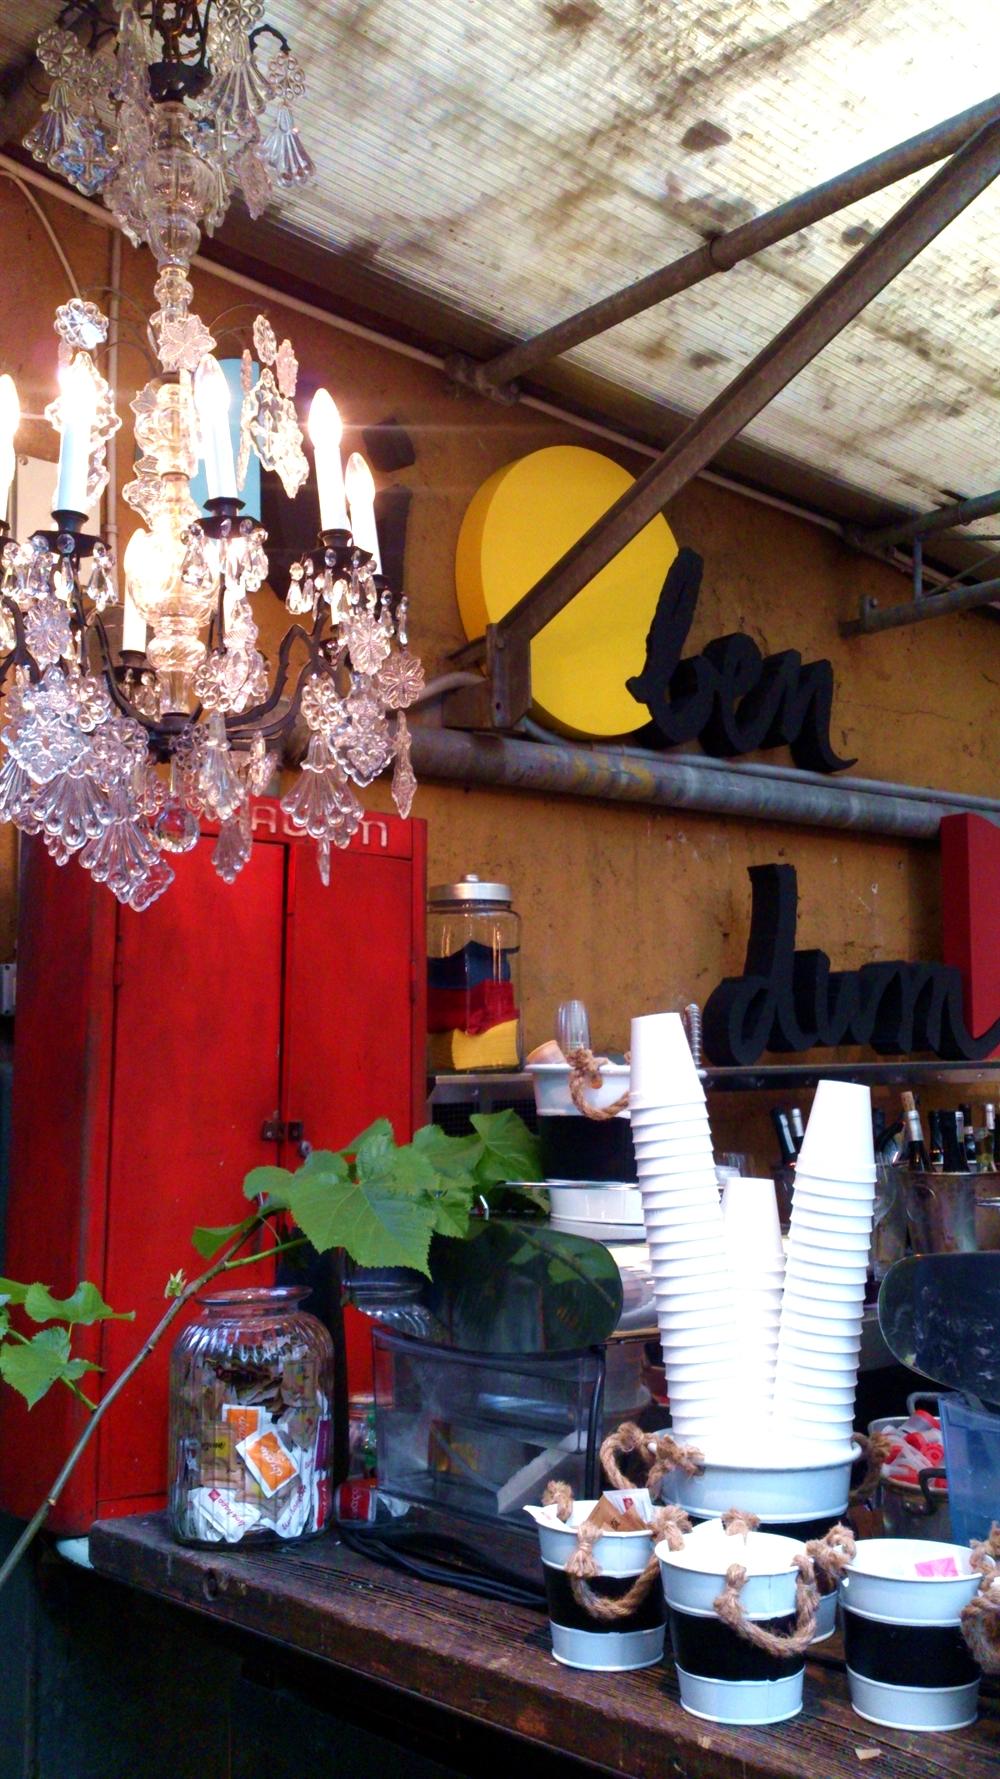 3 fuorisalone milan design week 2015 rossana orlandi nika zupanc gufram marimekko scarlet splendour interior design luxurious furniture meble luksusowe projektowanie marcel wanders